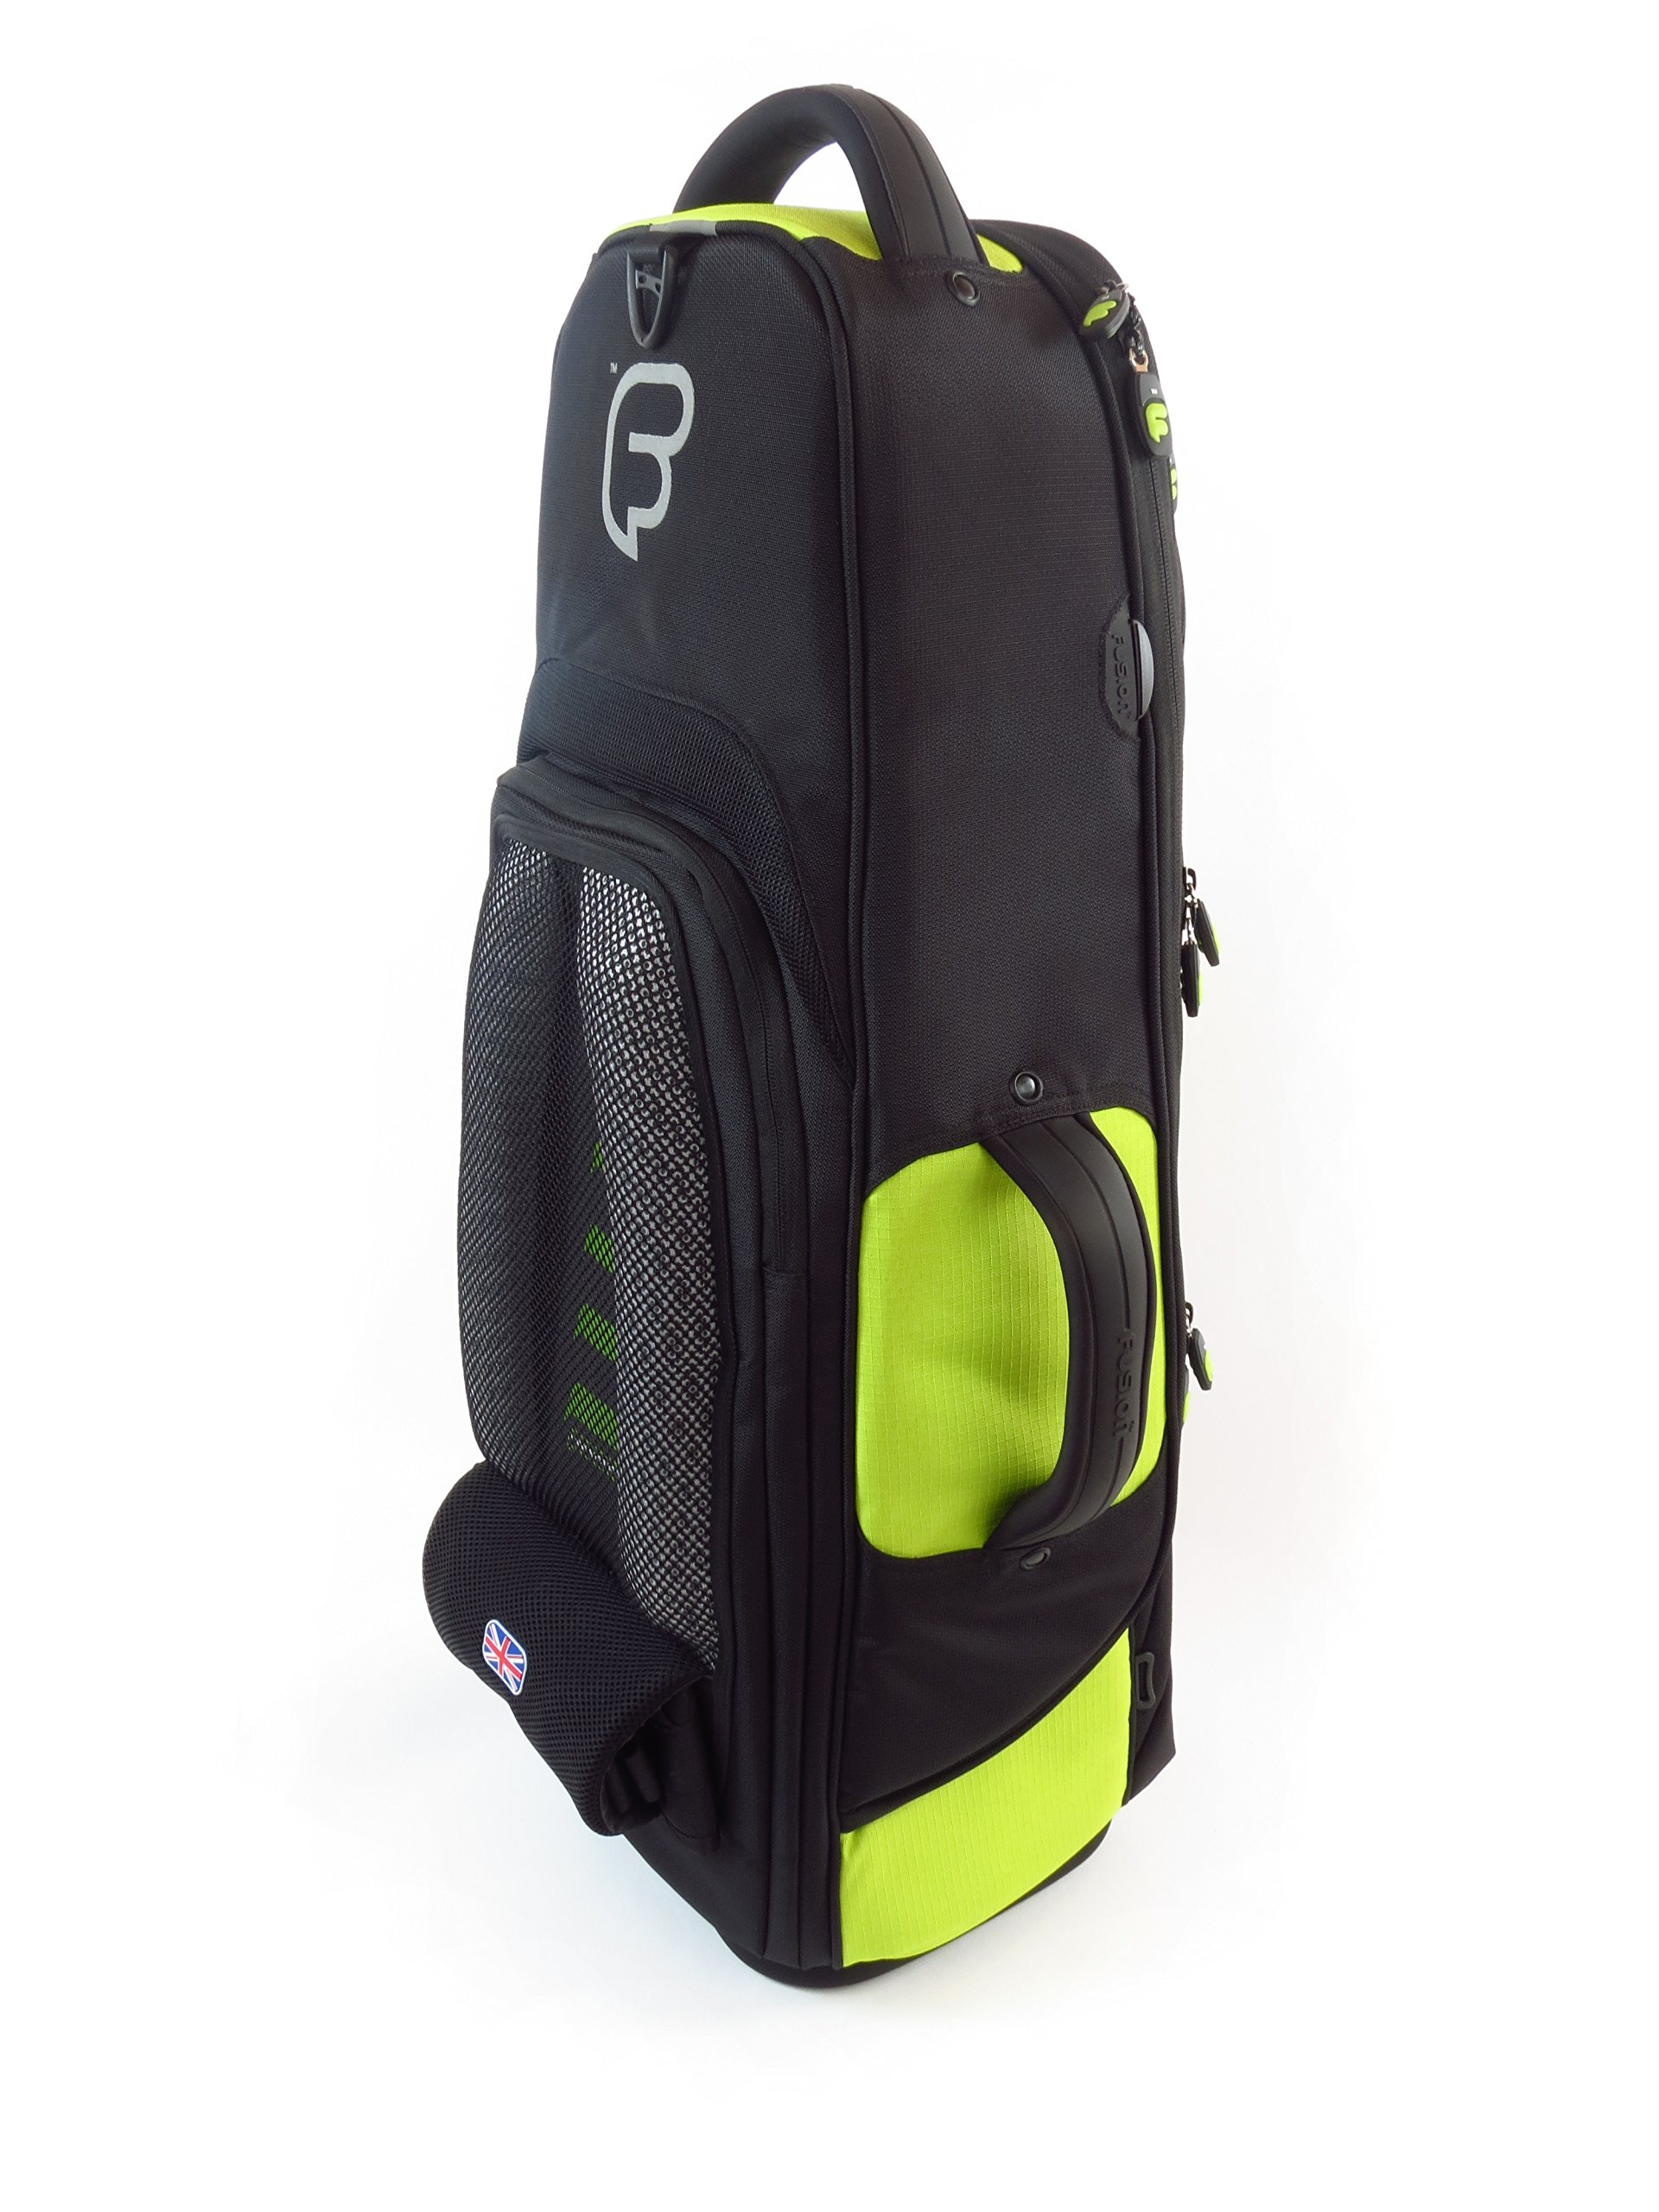 Fusion Premium Series (FB-PW-02-L) - Tenor Saxophone Gig Bag, Black/Lime by Fusion (Image #2)